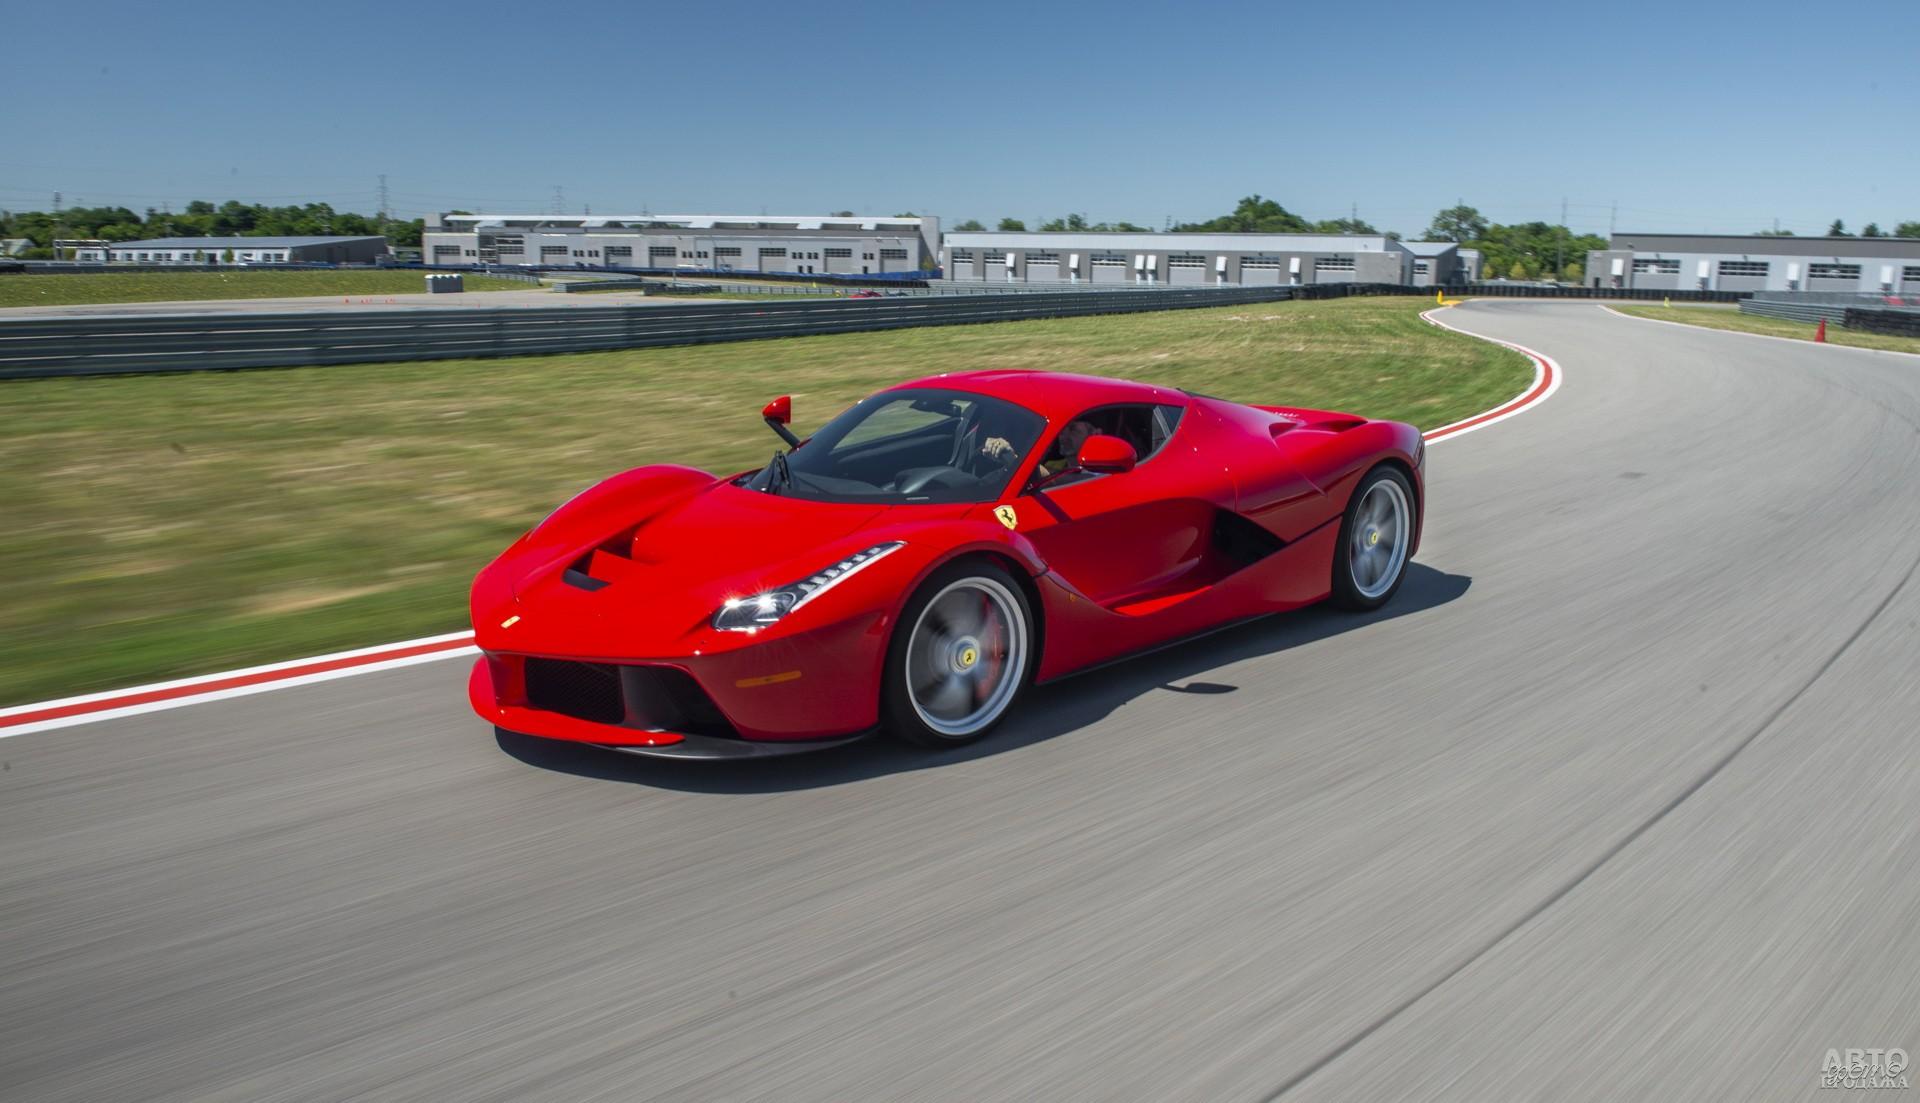 Гибрид Ferrari LaFerrari 2013 года